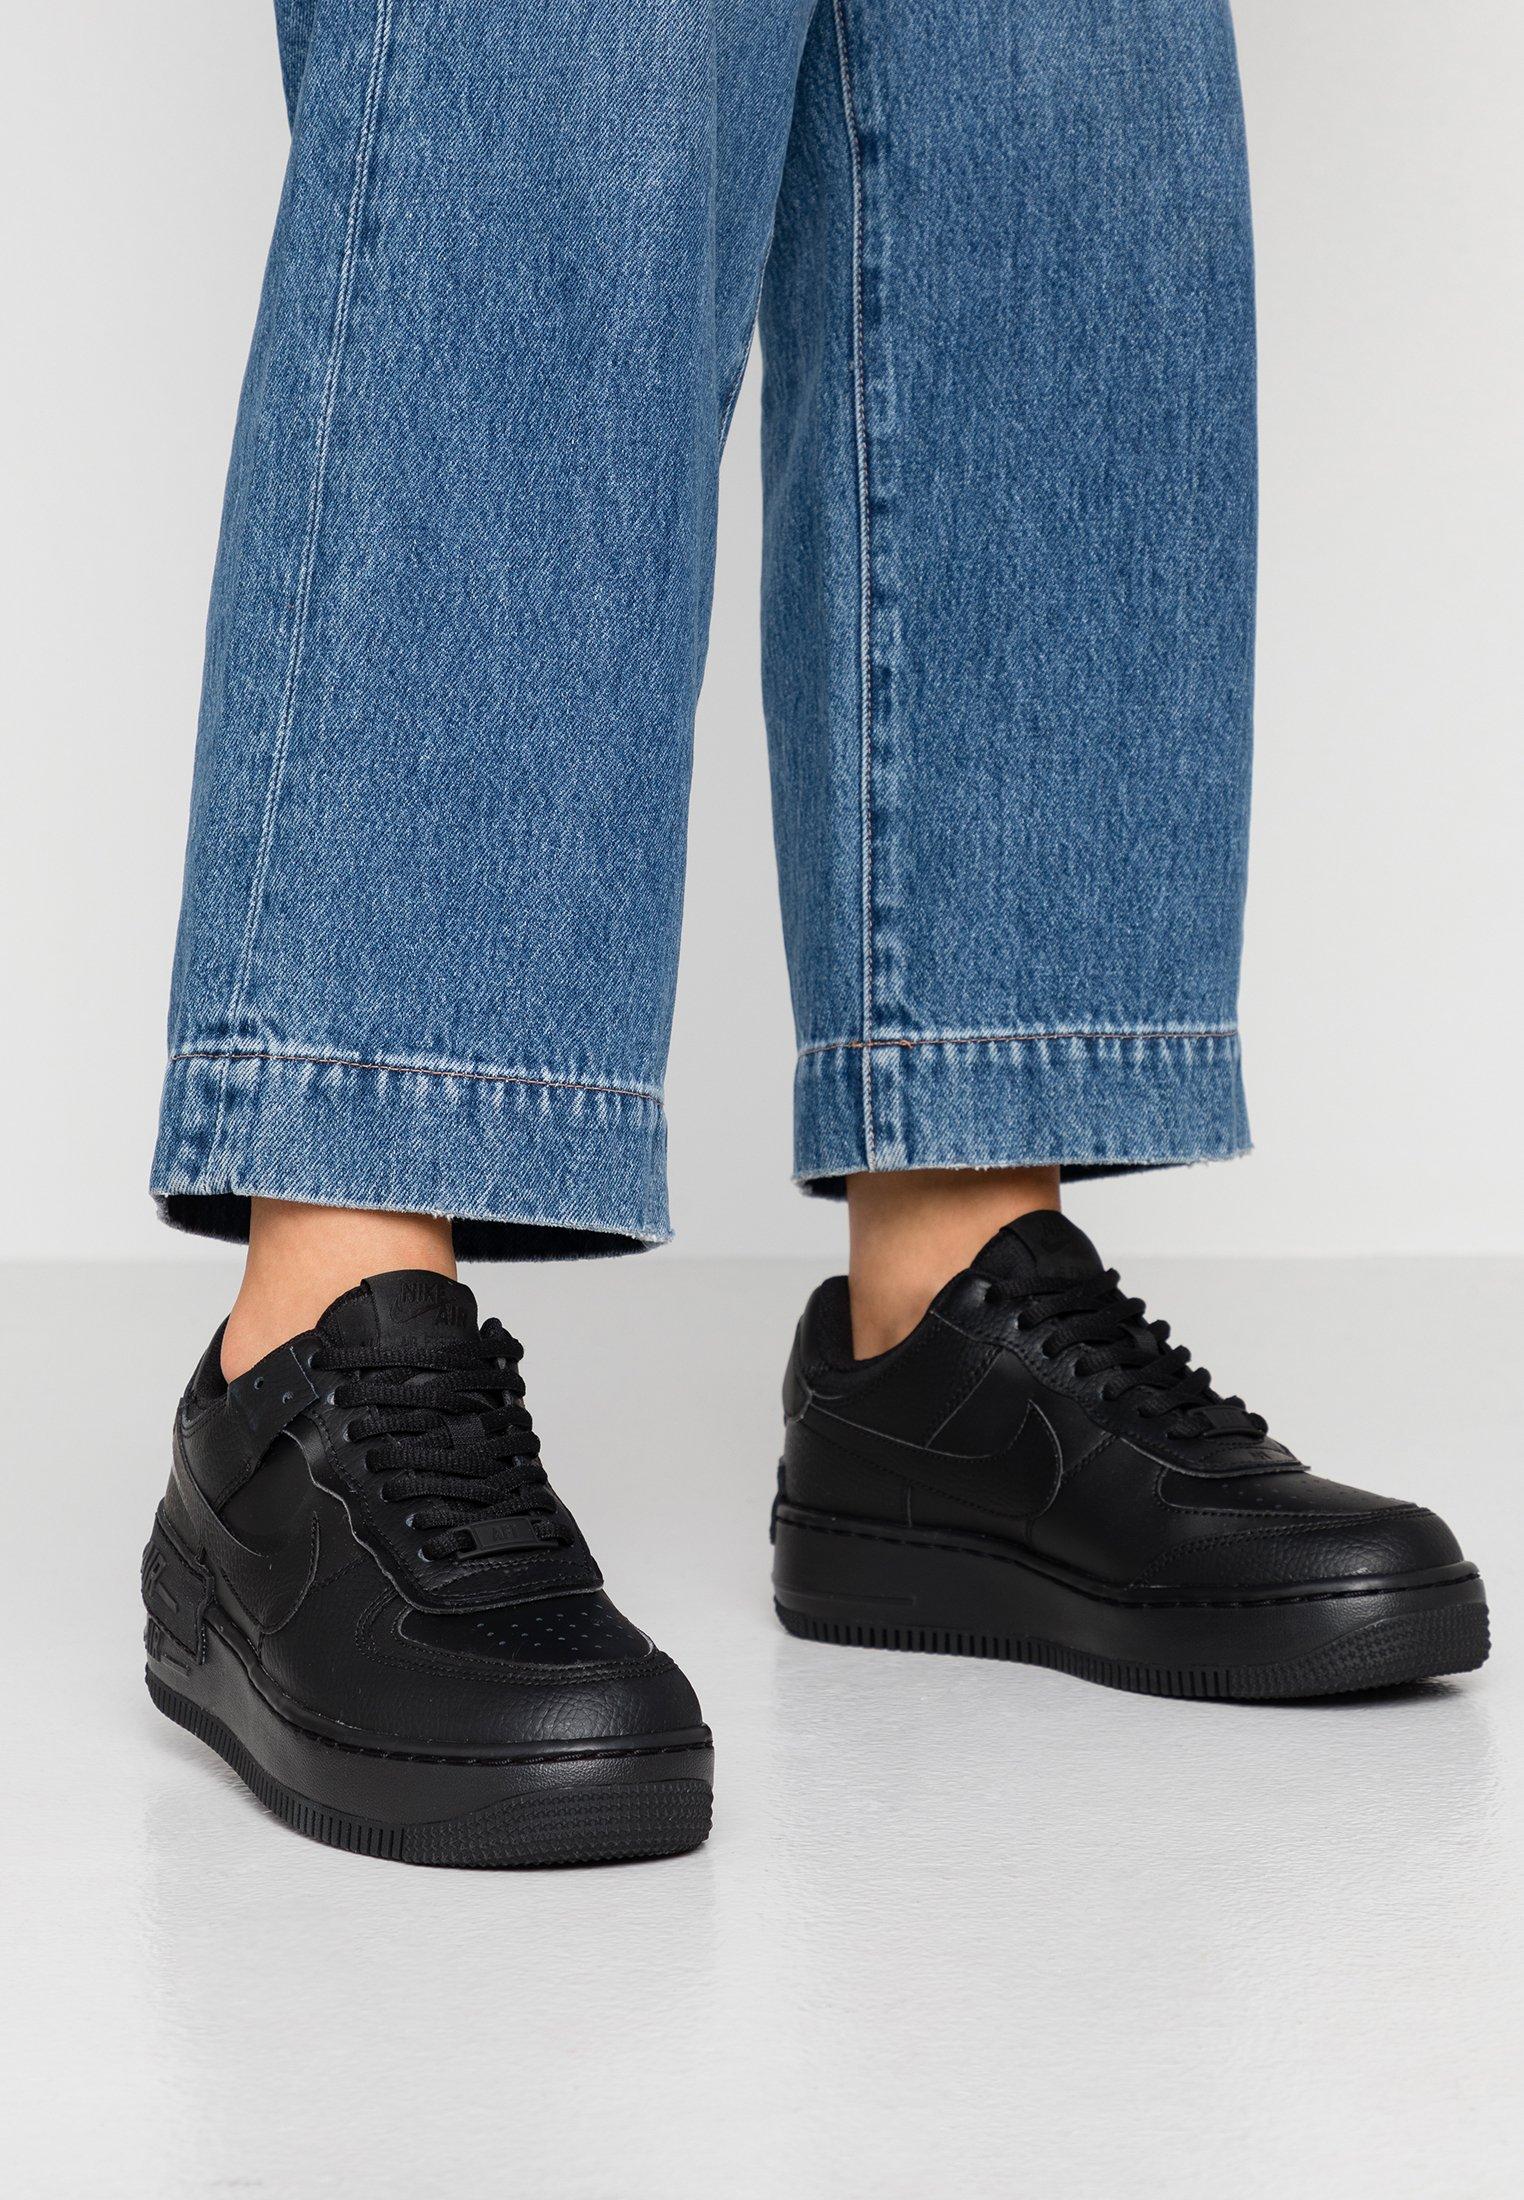 Nike Sportswear Air Force 1 Shadow Zapatillas Black Negro Zalando Es J'aime beaucoup les détails roses. air force 1 shadow zapatillas black